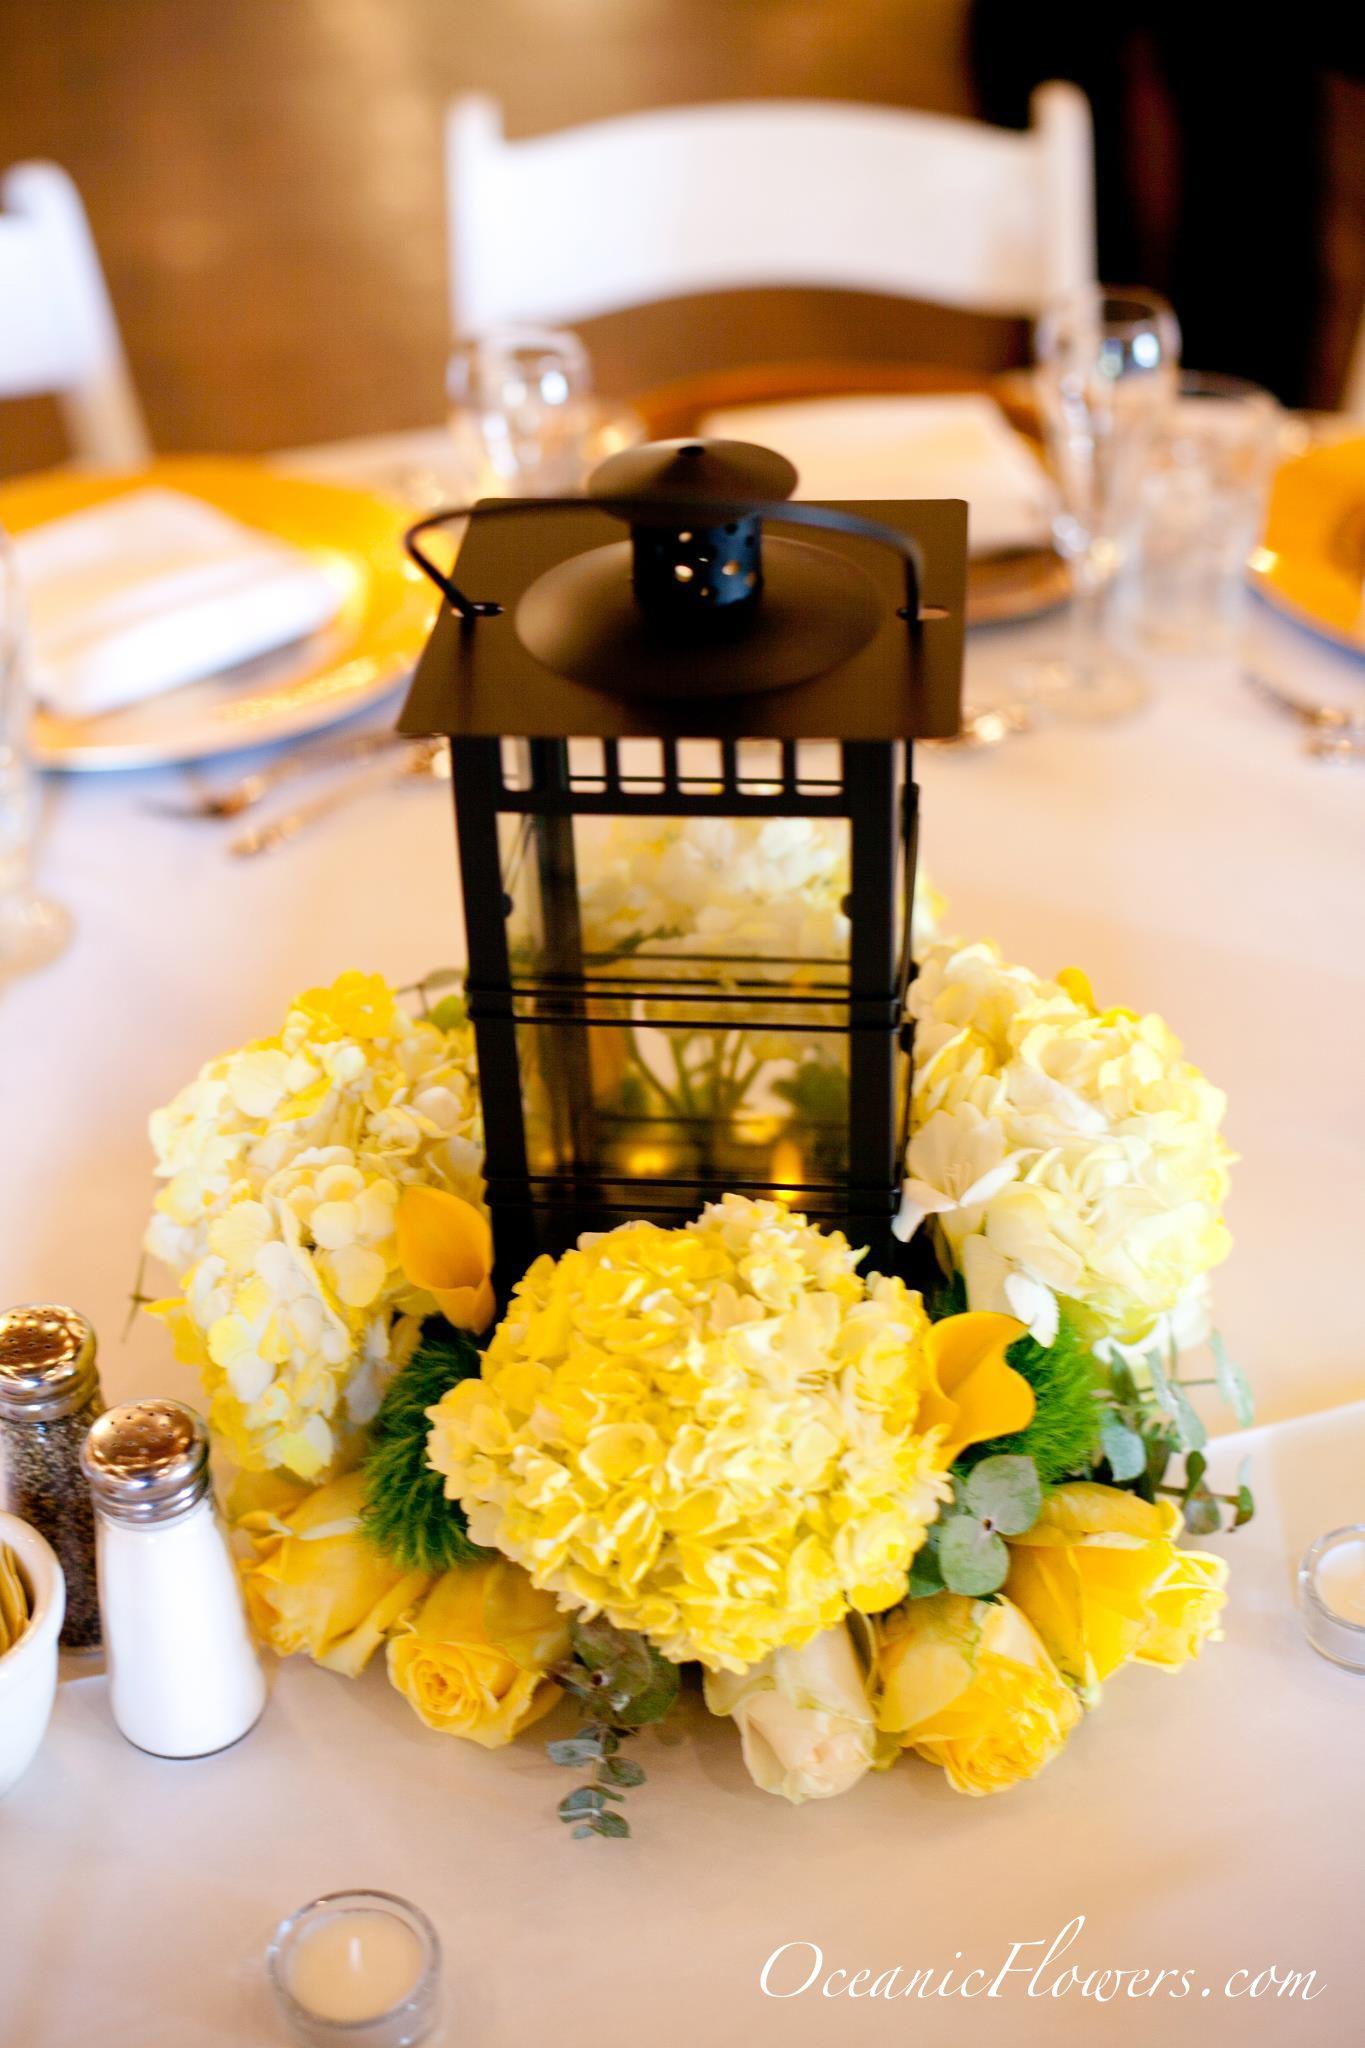 Wedding decoration ideas for tables  All Yellow Flower Medium Centerpiece with a Lantern  Wedding